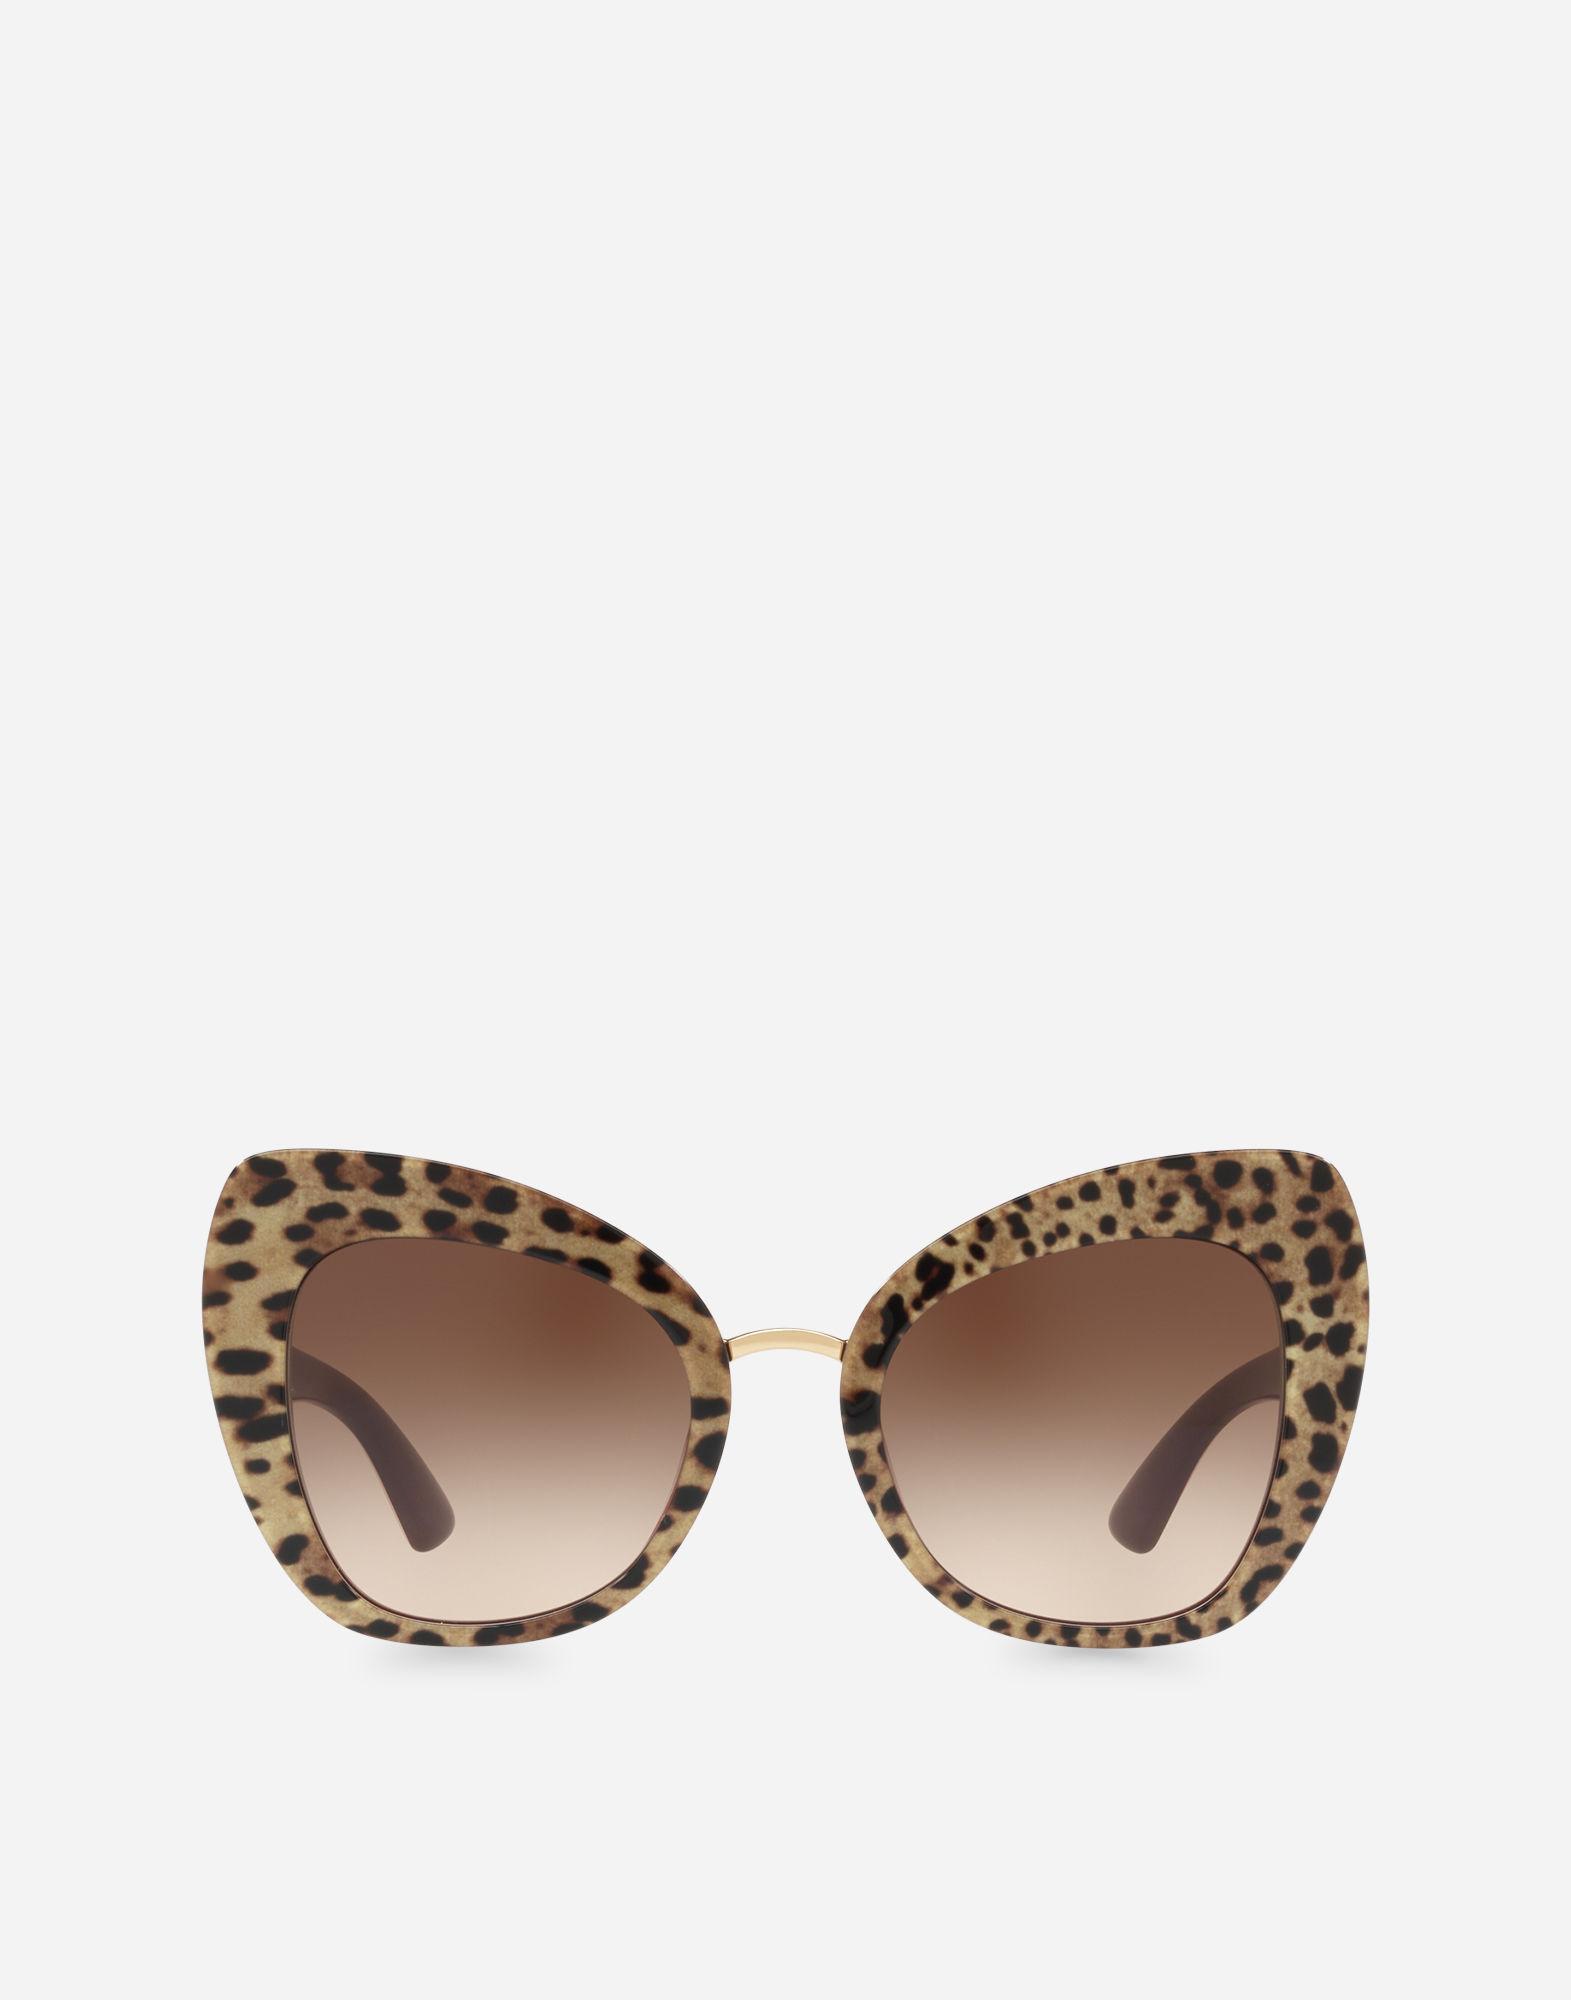 07bbc57ffc807 Dolce   Gabbana Butterfly Sunglasses In Leopard Print Acetate In Leopard  Print On Bordeaux Base